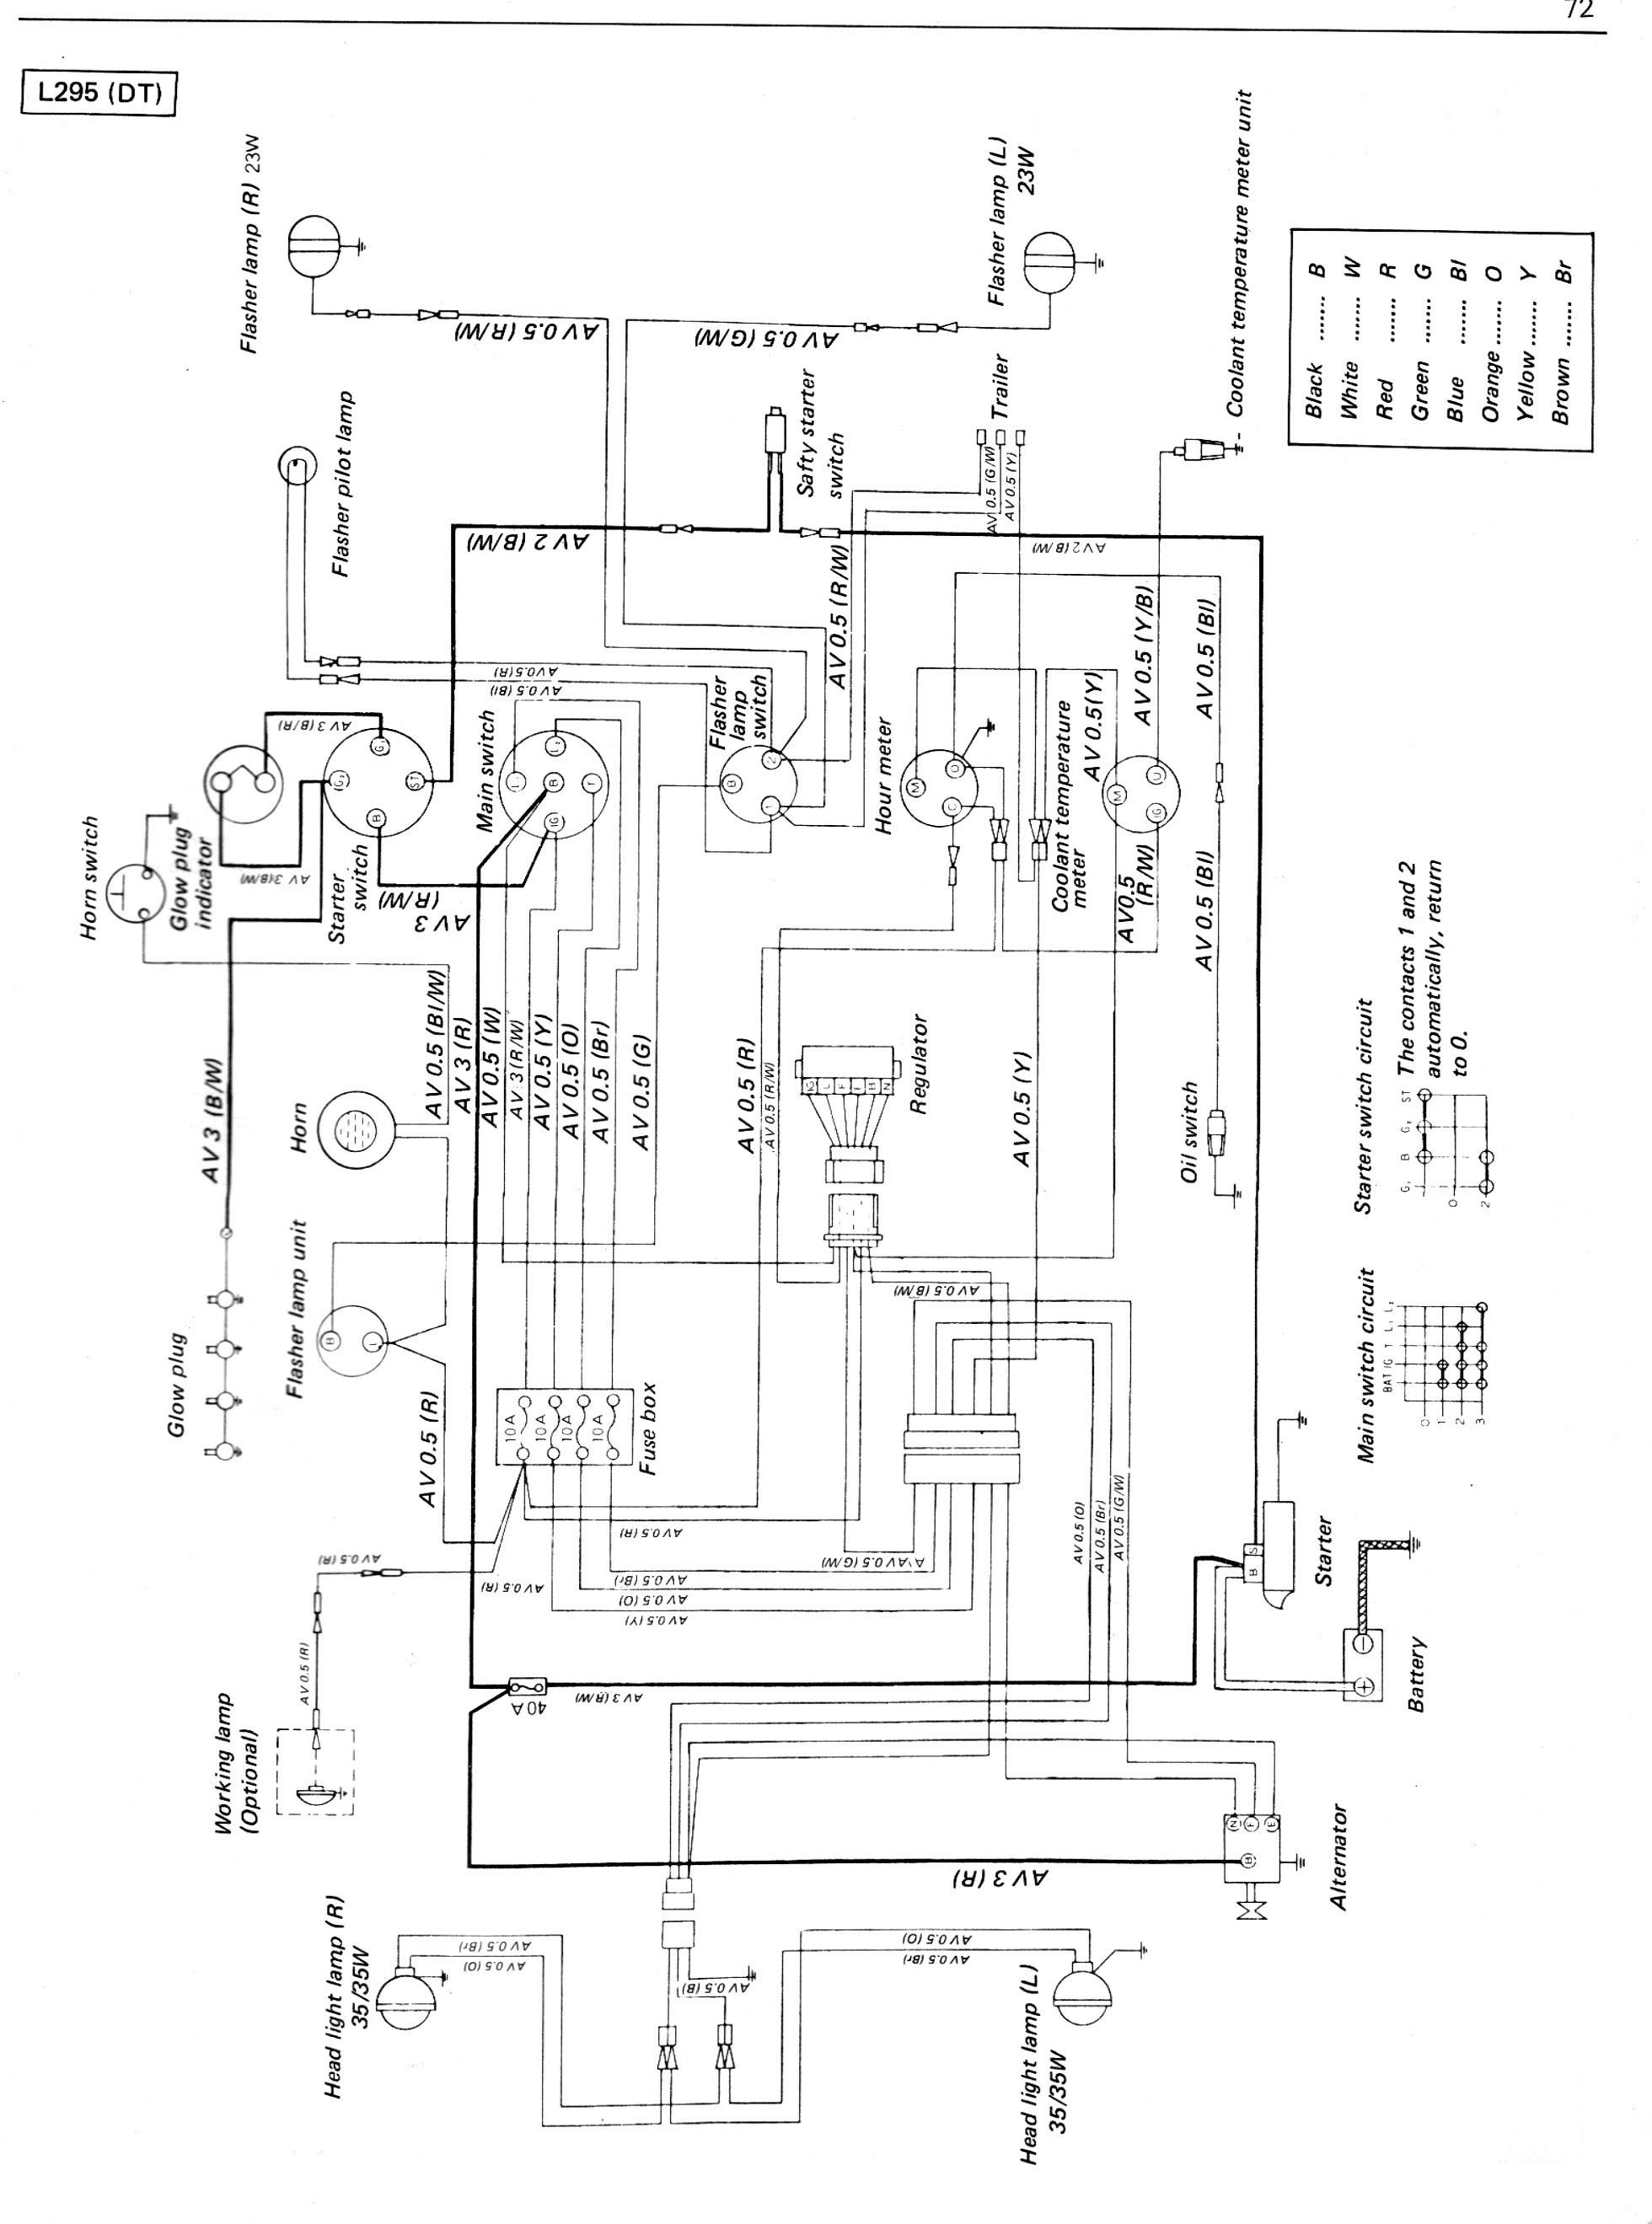 hight resolution of 7 3 diesel engine diagram vw wiring diagram alternator new diesel engine alternator wiring of 7